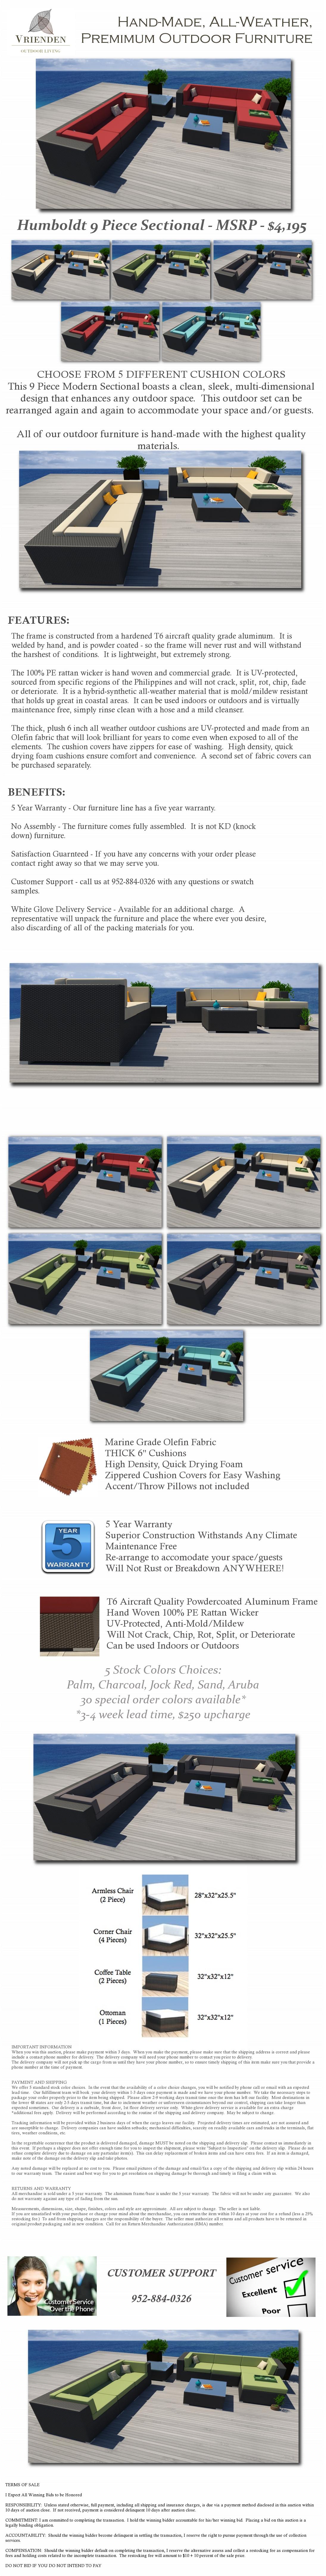 9PC Modern Gray Wicker Patio Set Outdoor Sectional Sofa ...